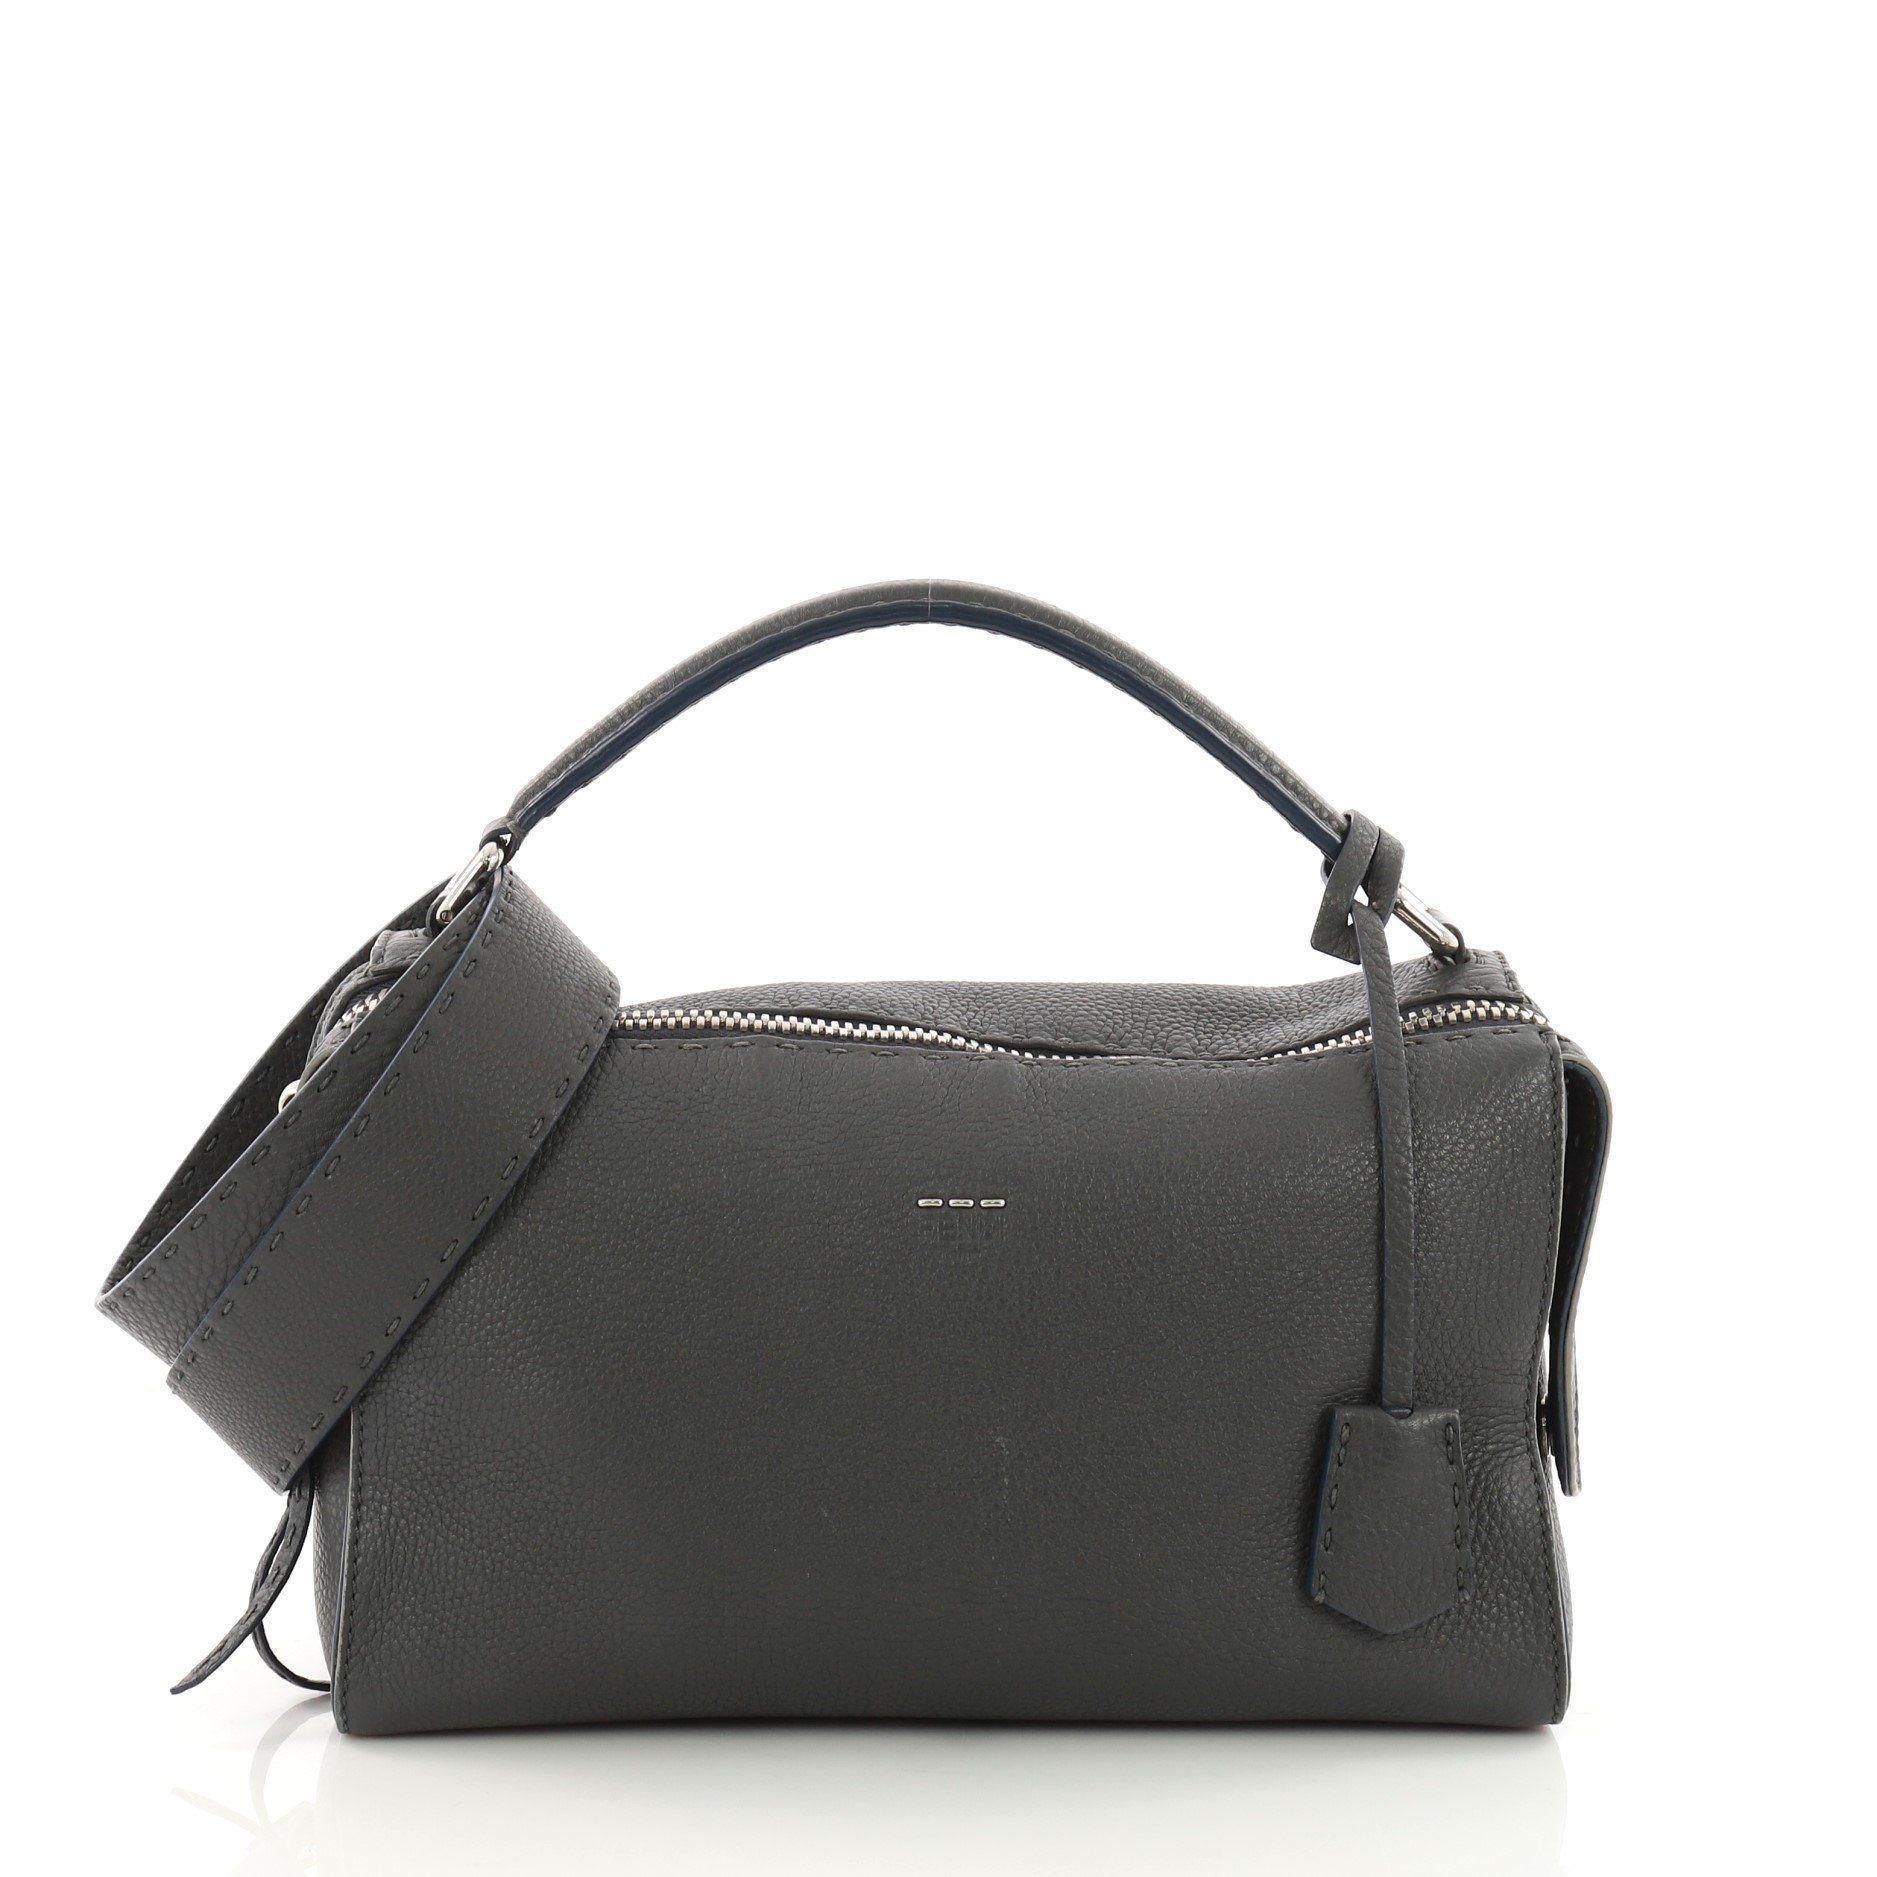 64609873b9bd Fendi Pre Owned Selleria Lei Bag Leather in Black - Lyst